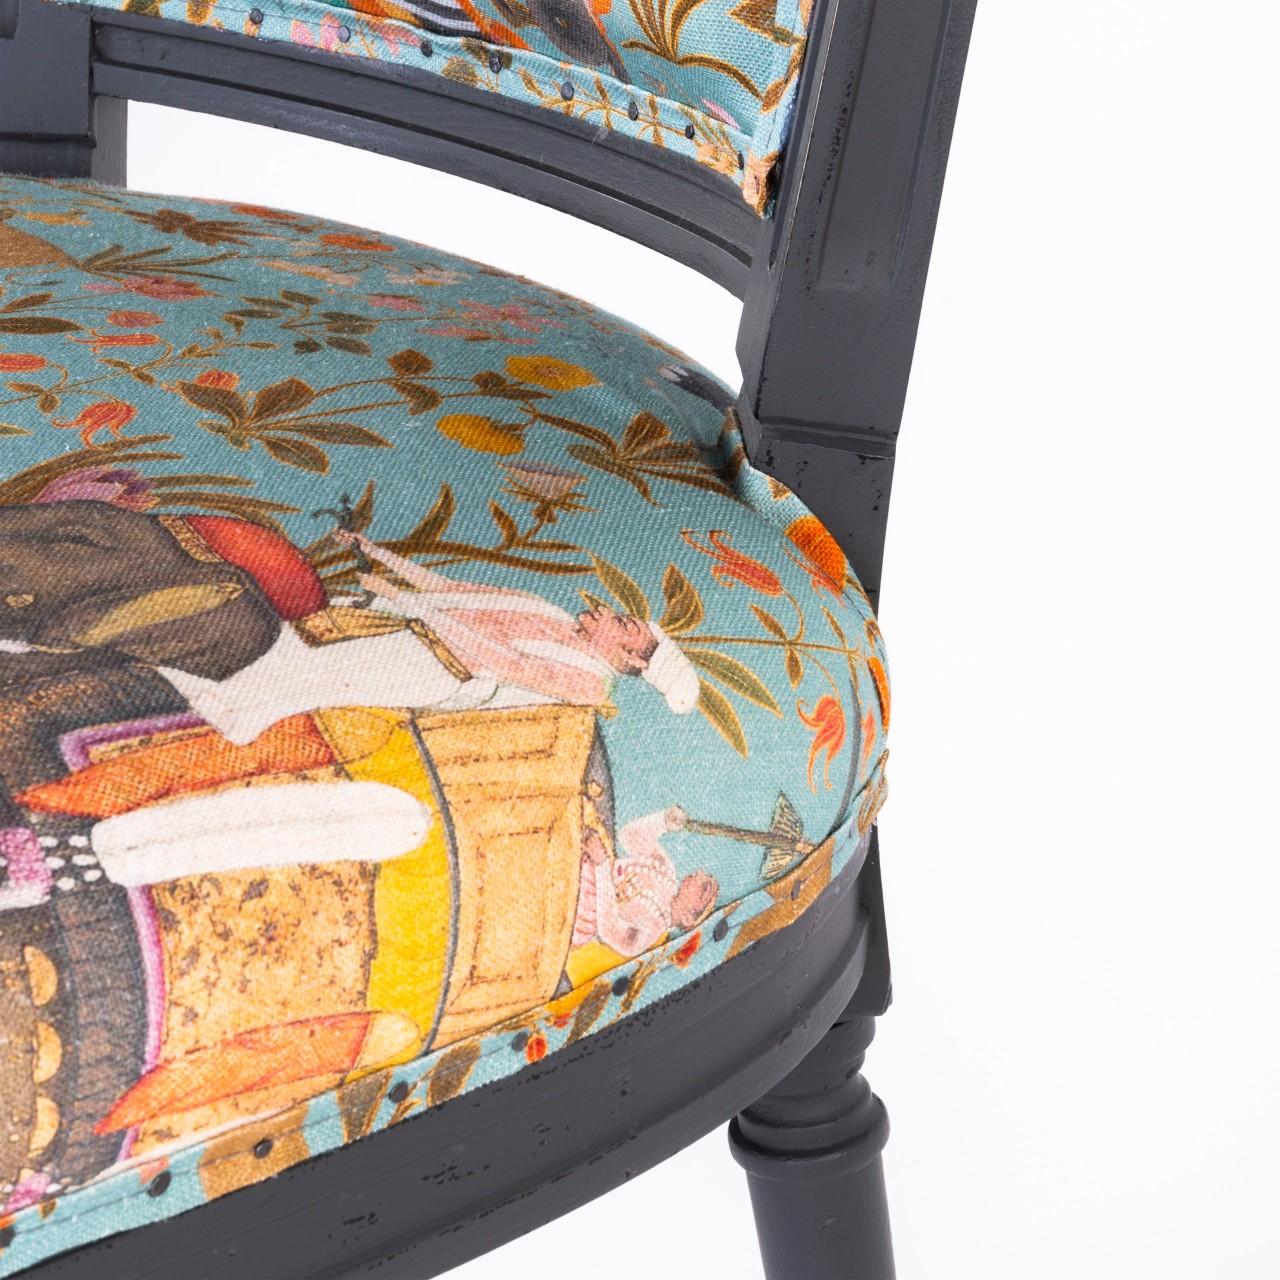 PROVENCE Dining Chair - HINDUSTAN AQUAMARINE Linen